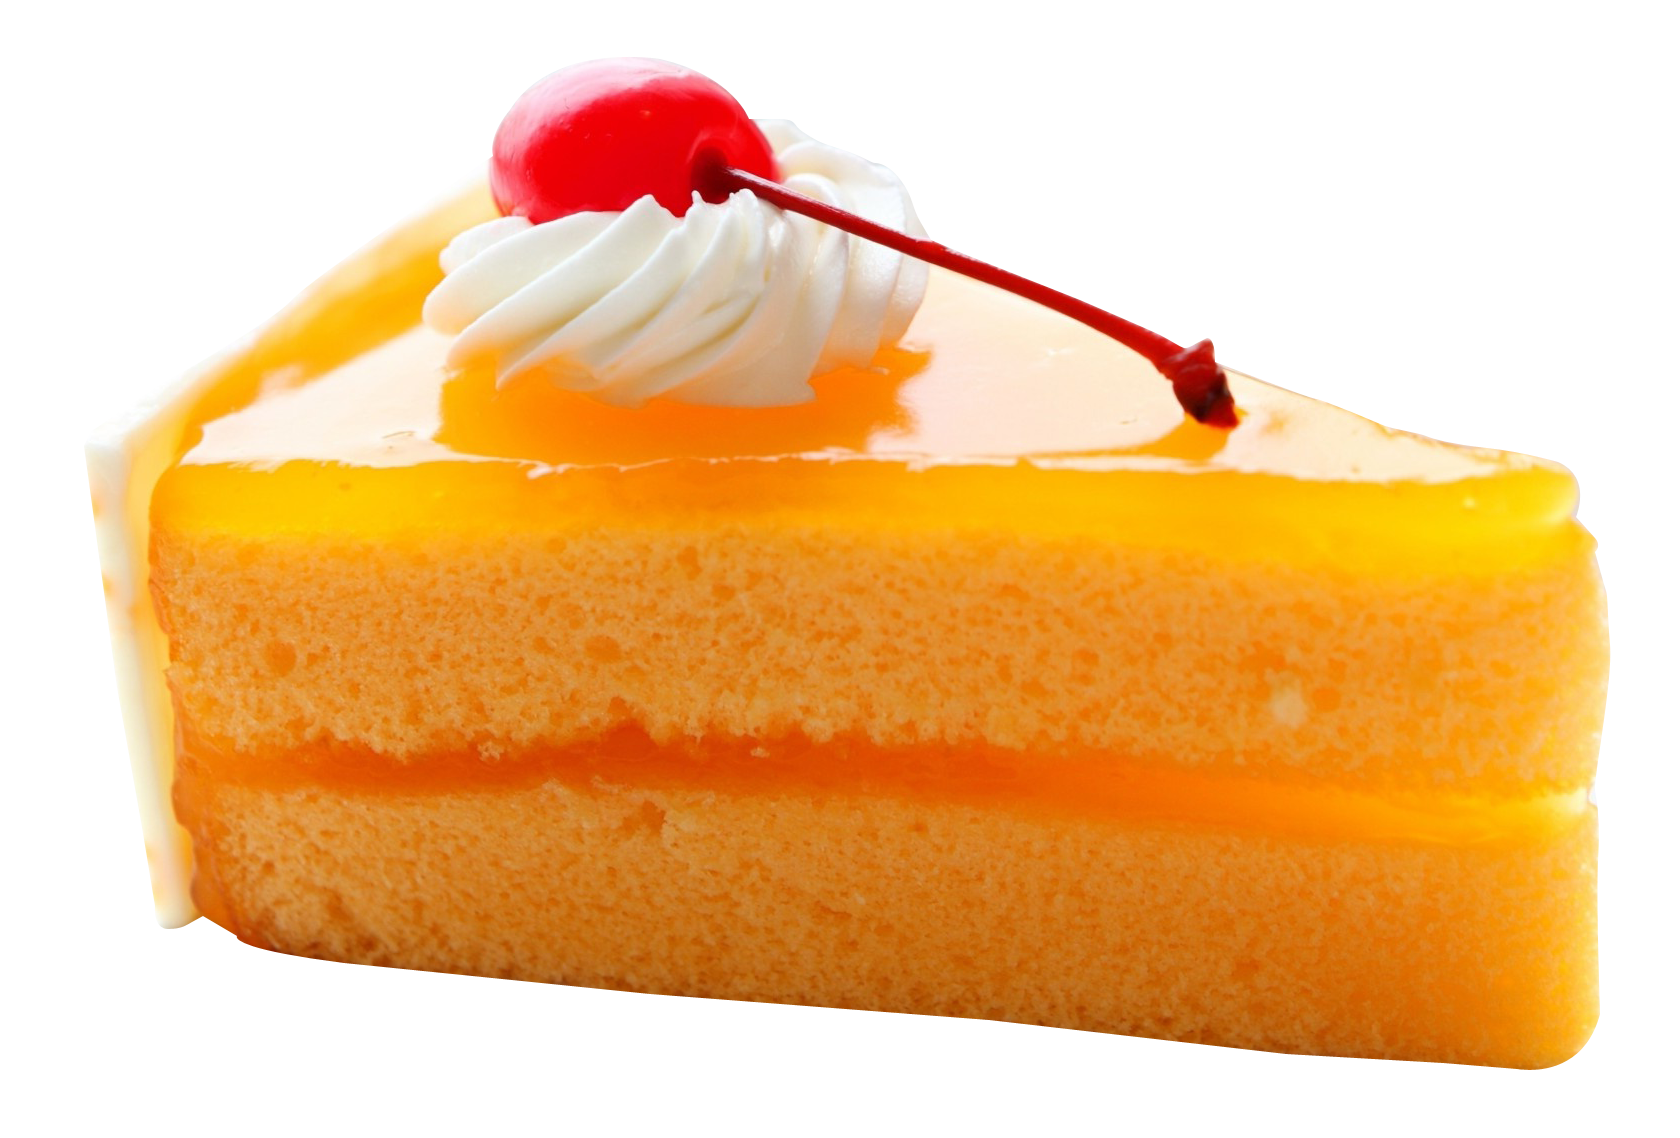 Carrot Cake Image Background Transparent